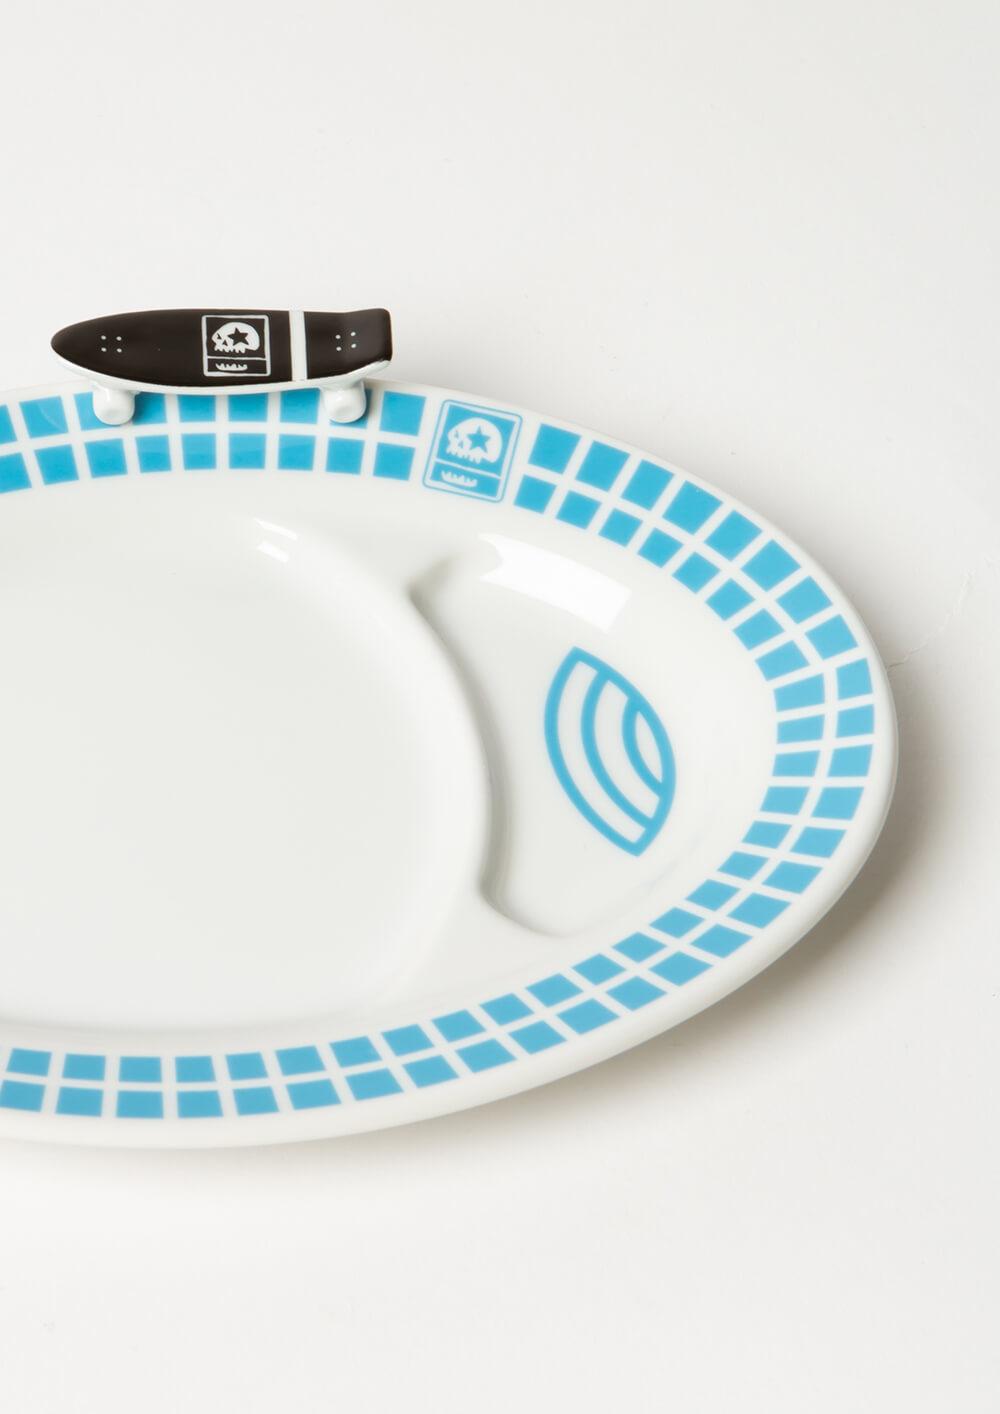 [予約・6月末納期] MY POOL SET (餃子皿+箸置き)